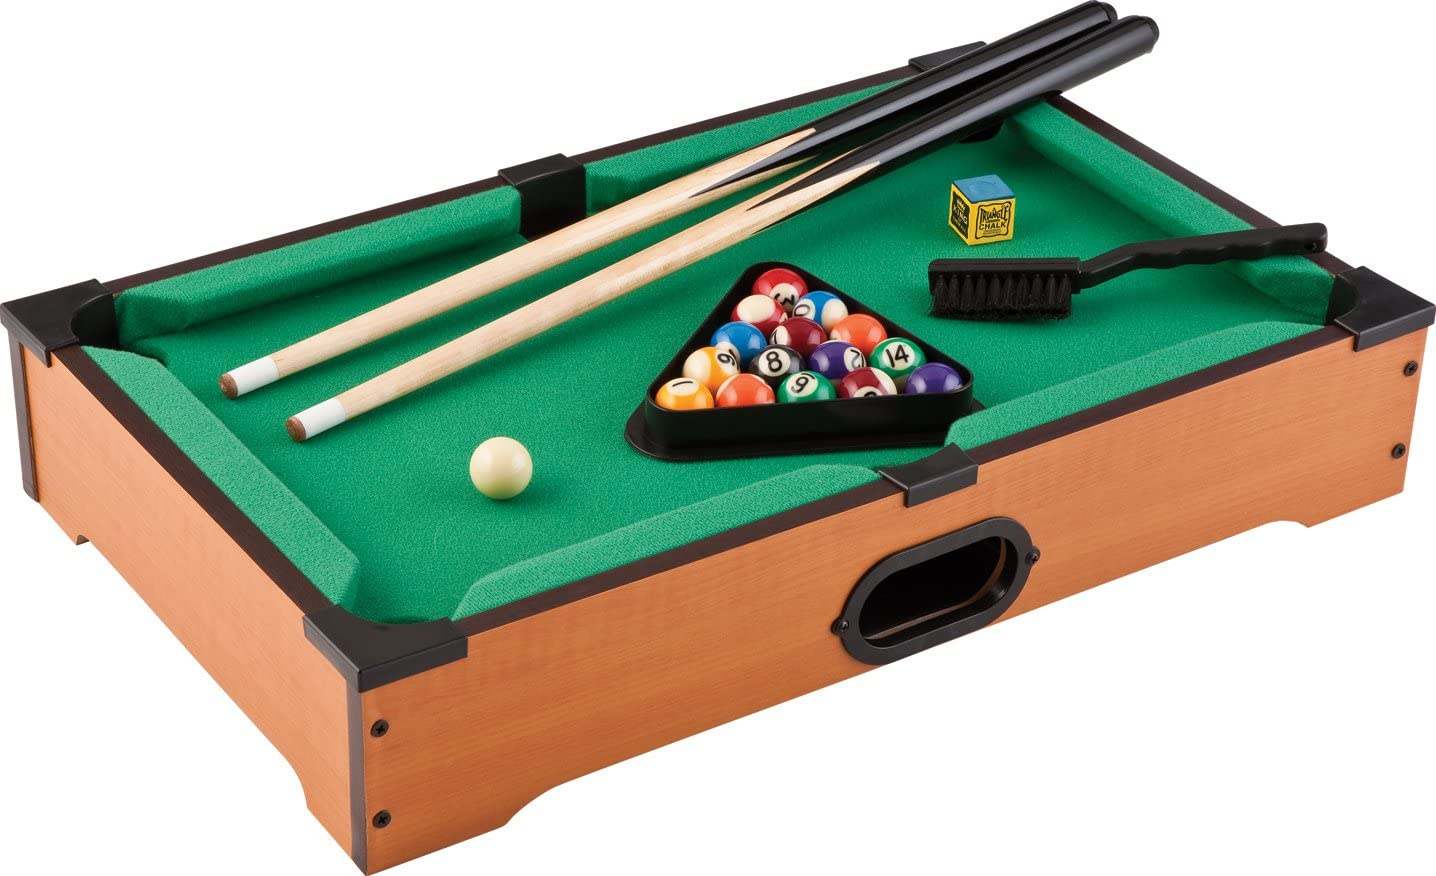 Mainstreet Classics 20-Inch Table Top Miniature Billiard/Pool Game Set : Tabletop Billiards Games : Sports & Outdoors